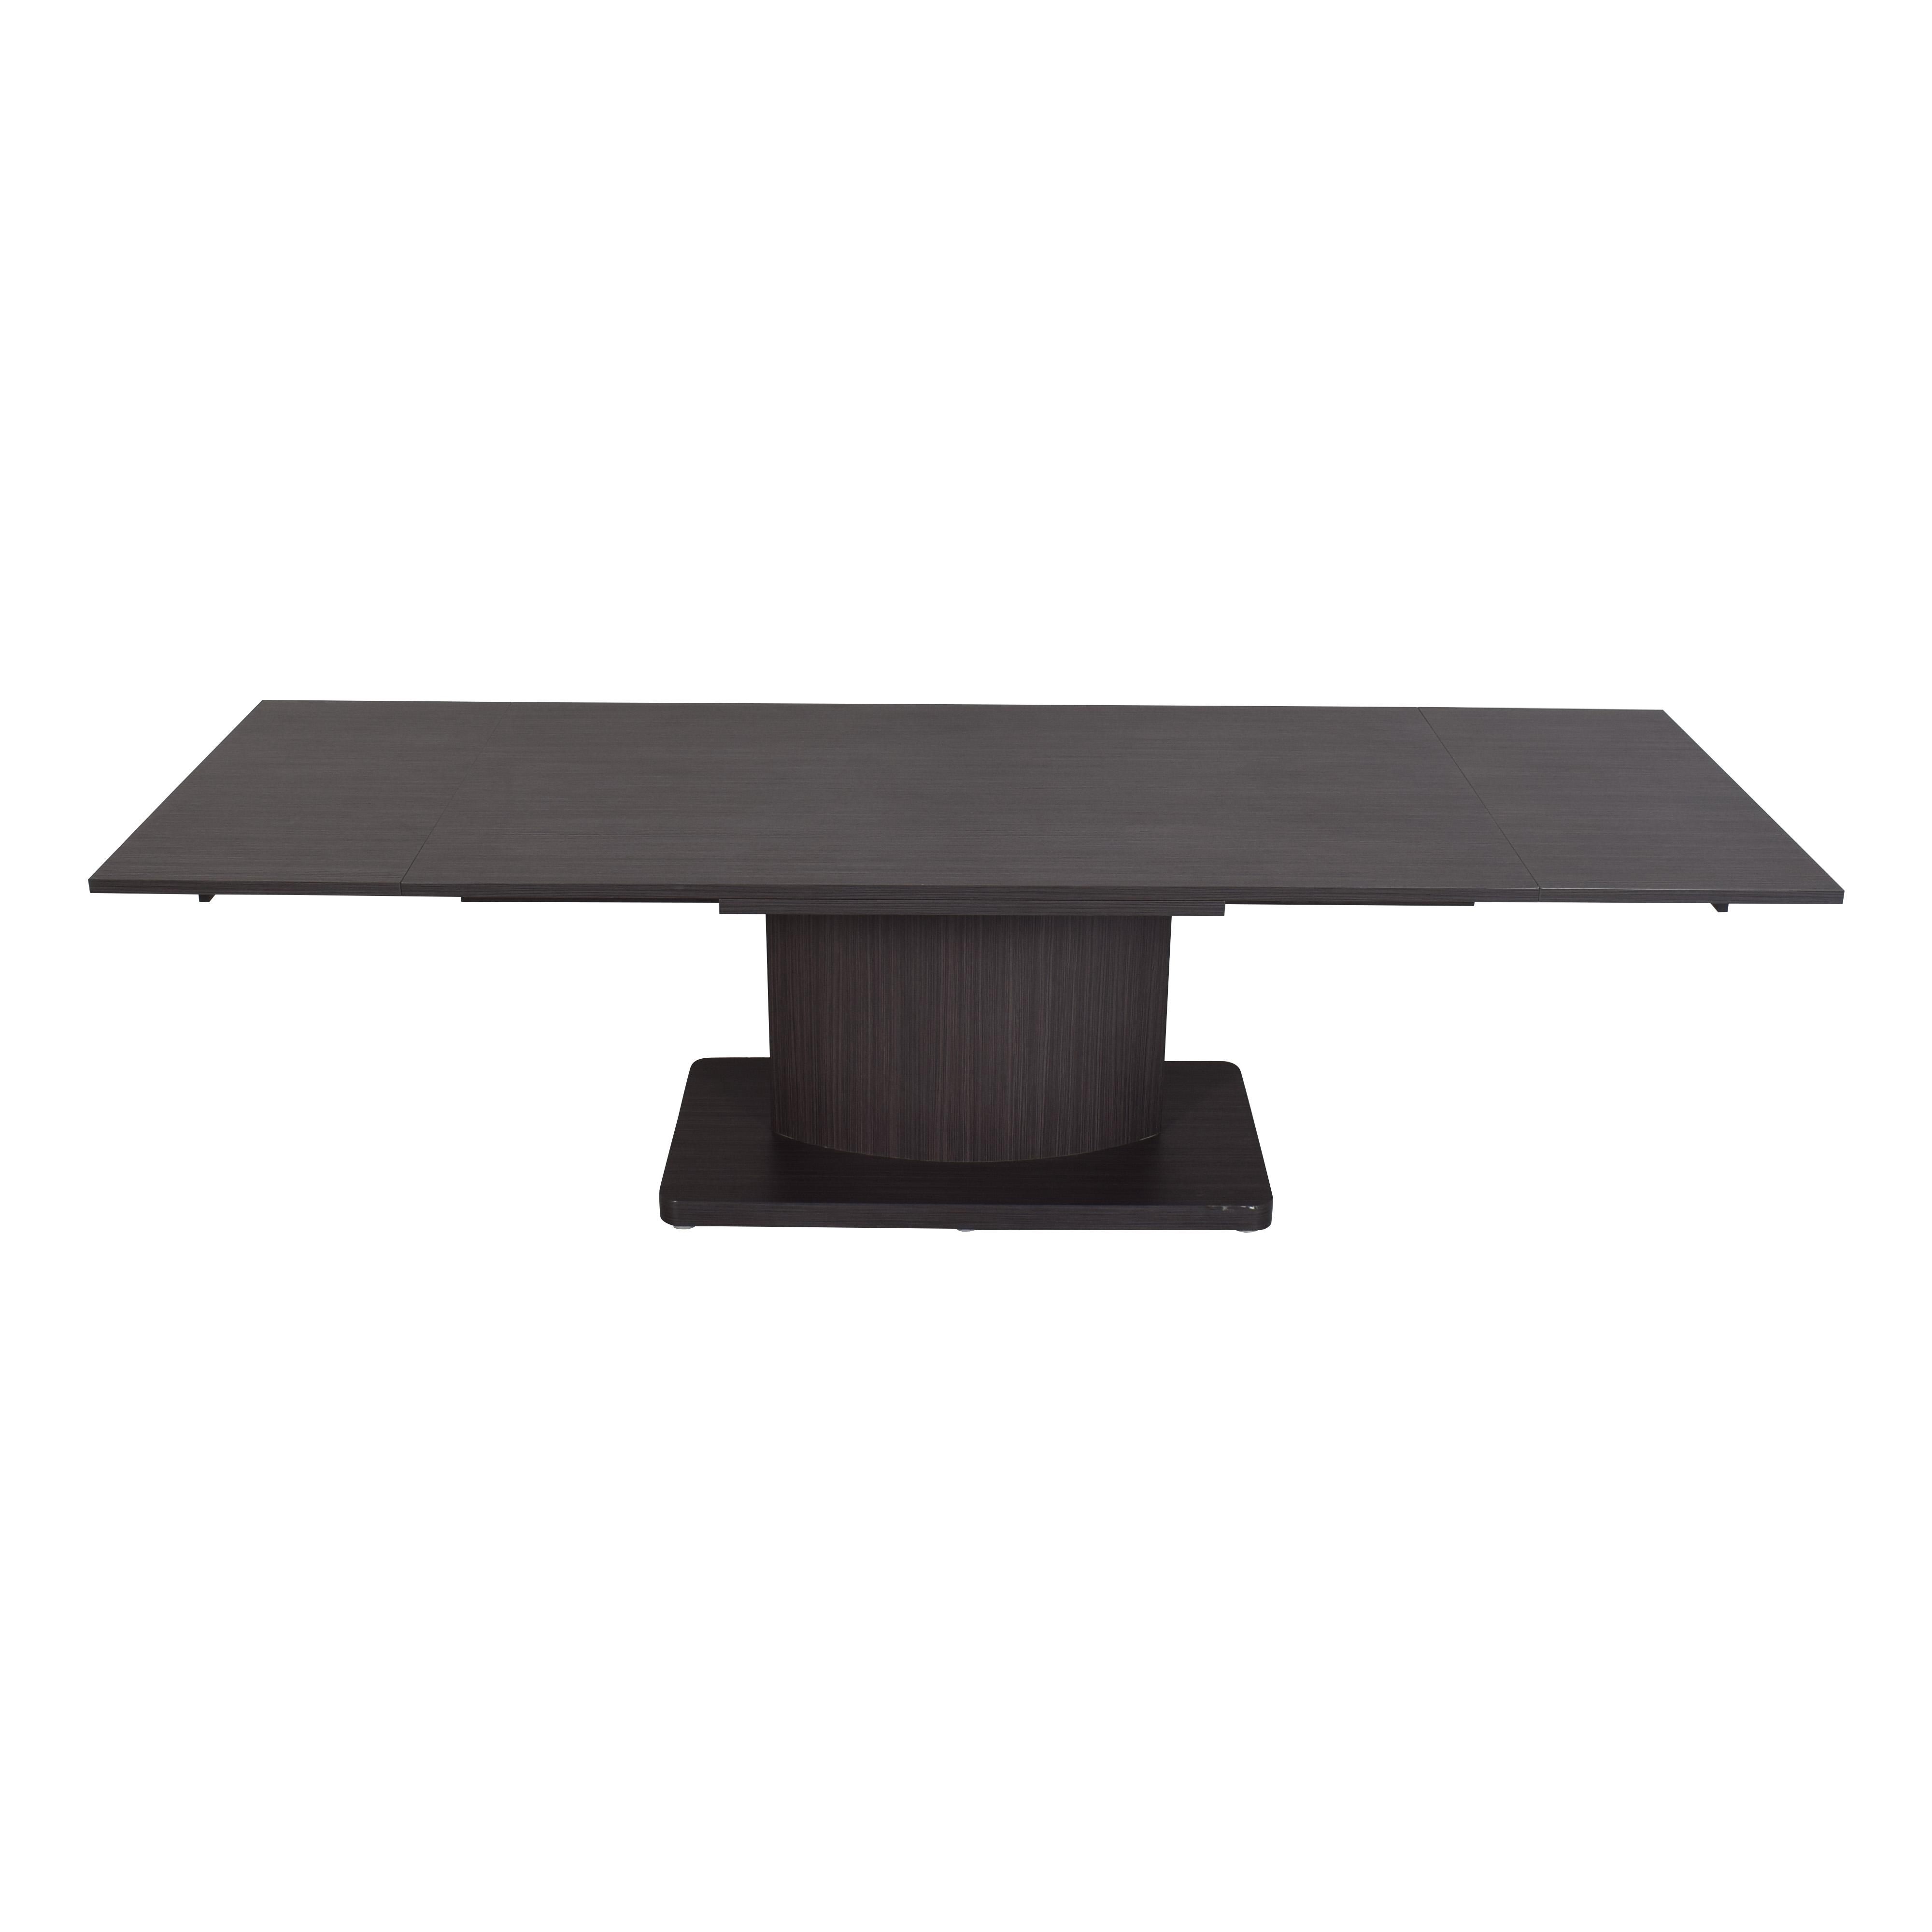 Lazzoni Lazzoni Raena Extendable Dining Table on sale